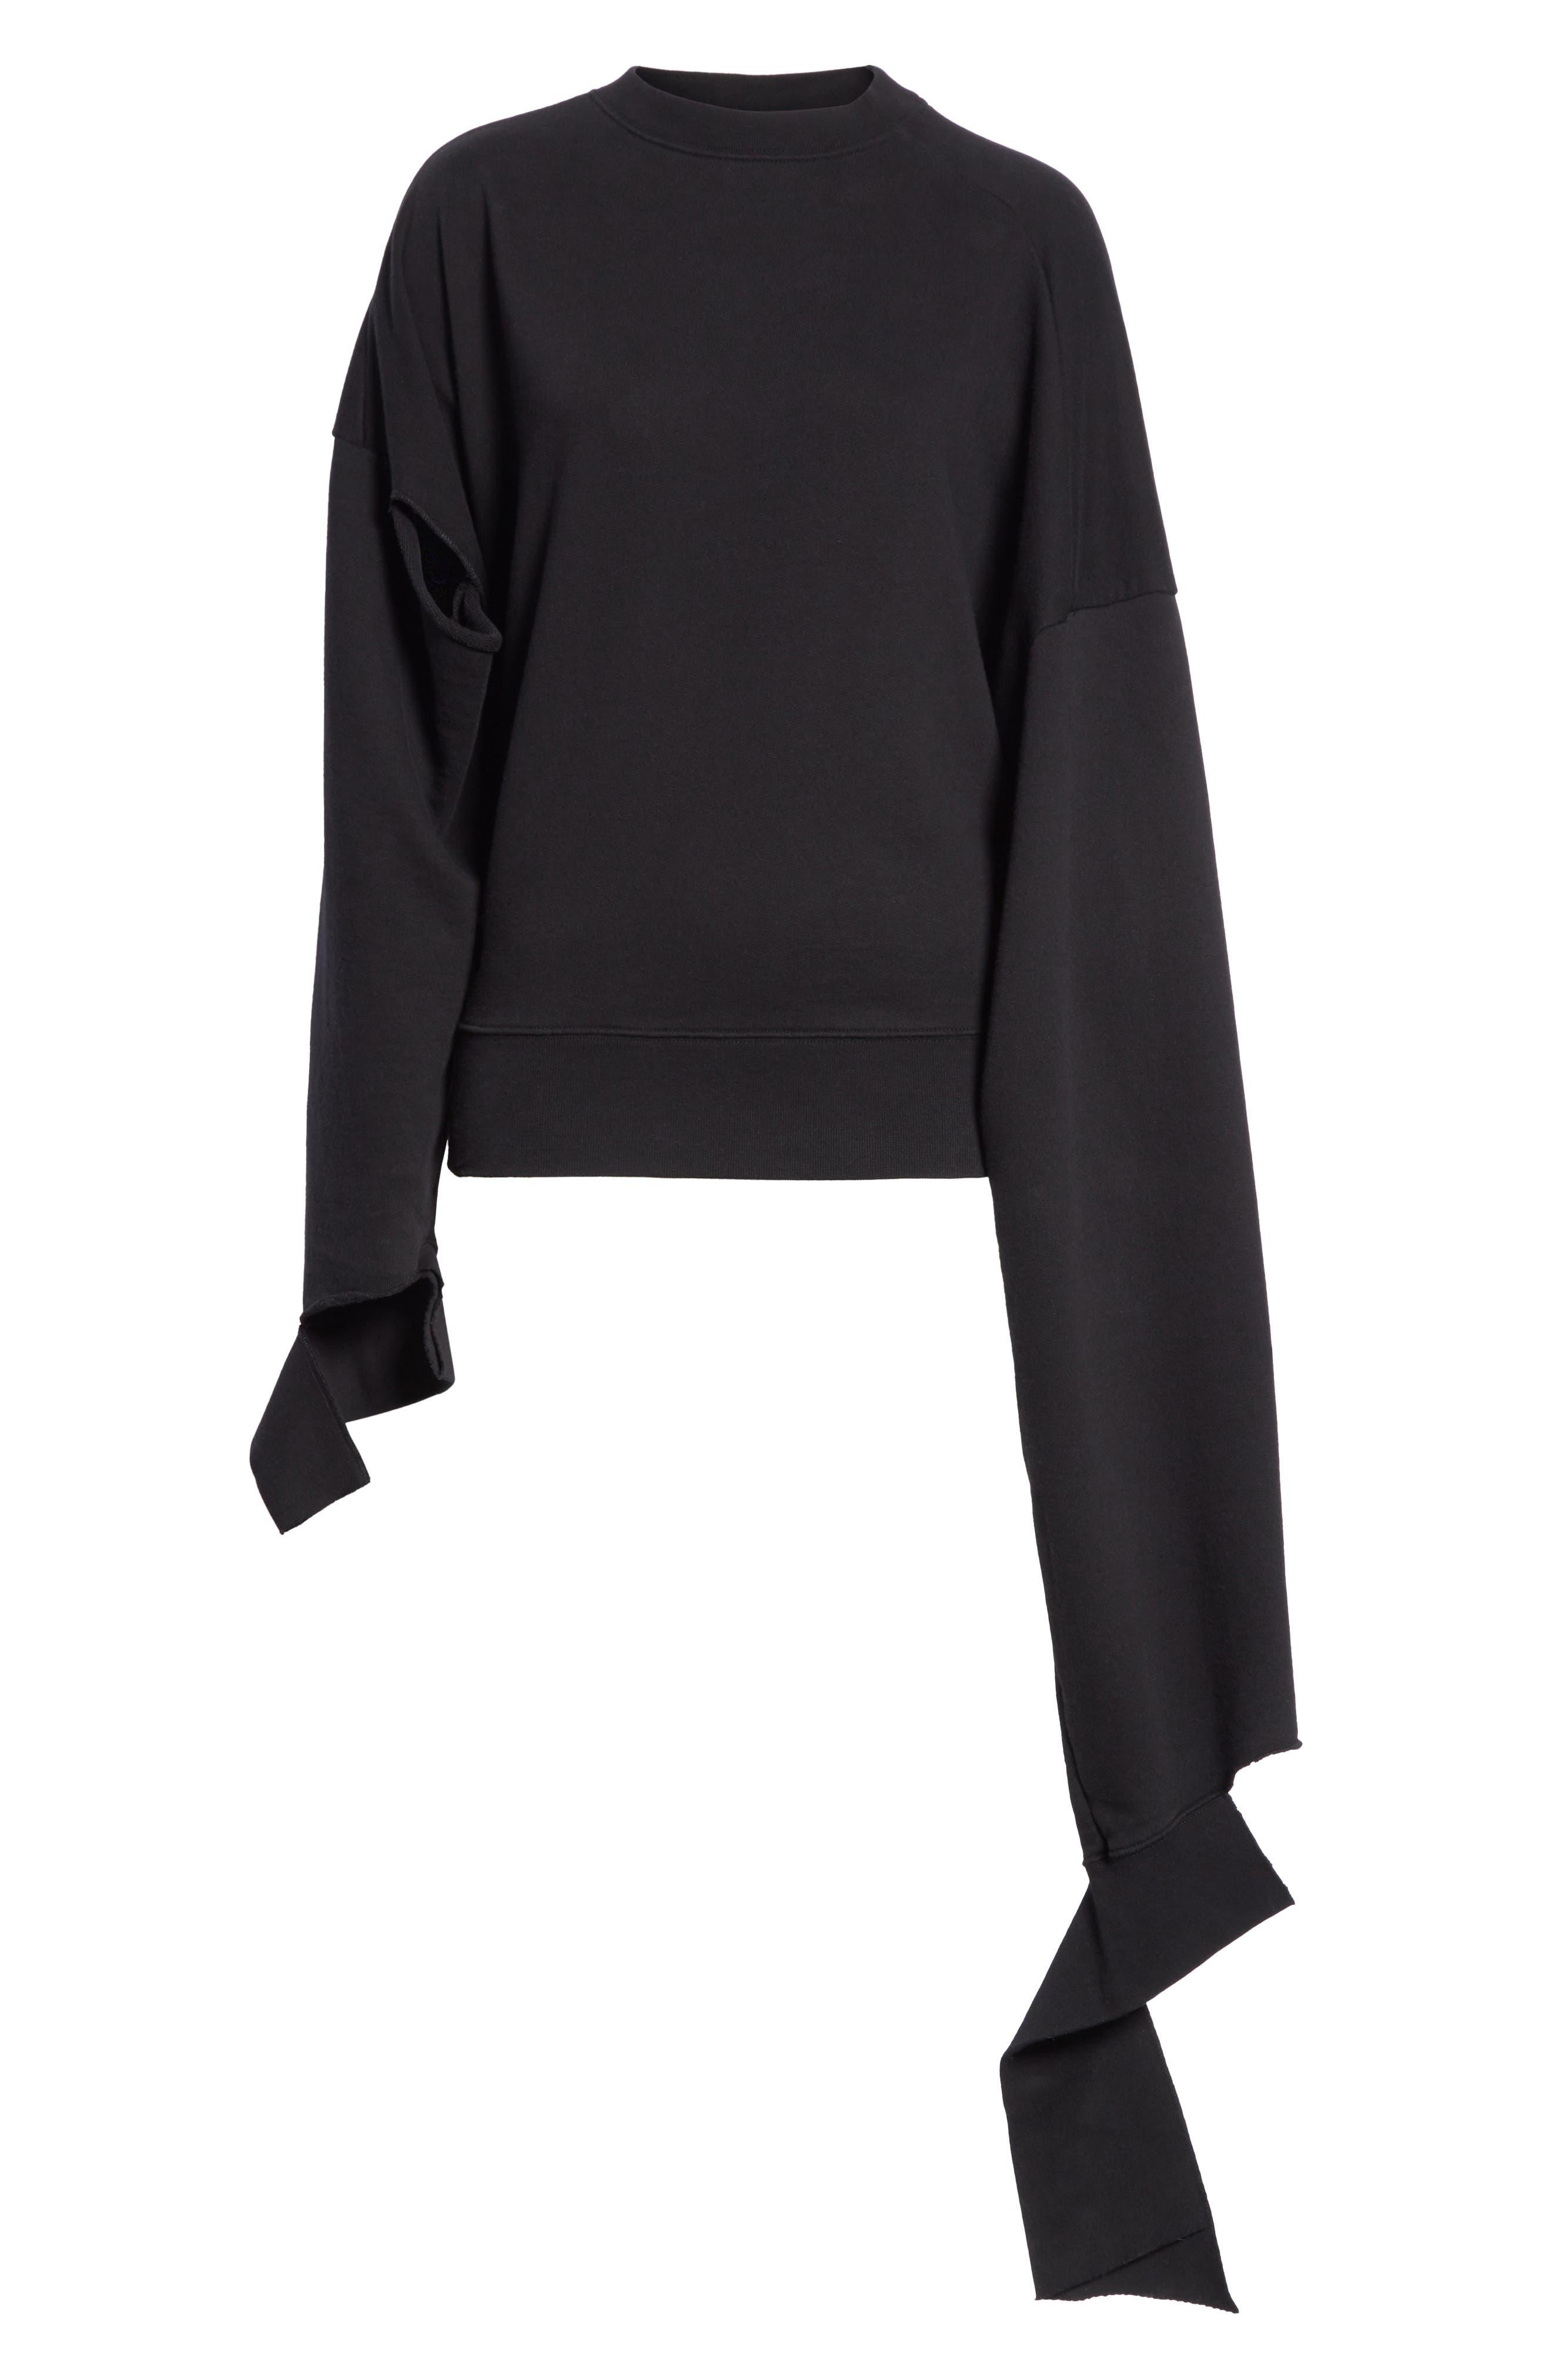 In Progress Crewneck Sweatshirt,                             Alternate thumbnail 6, color,                             Black